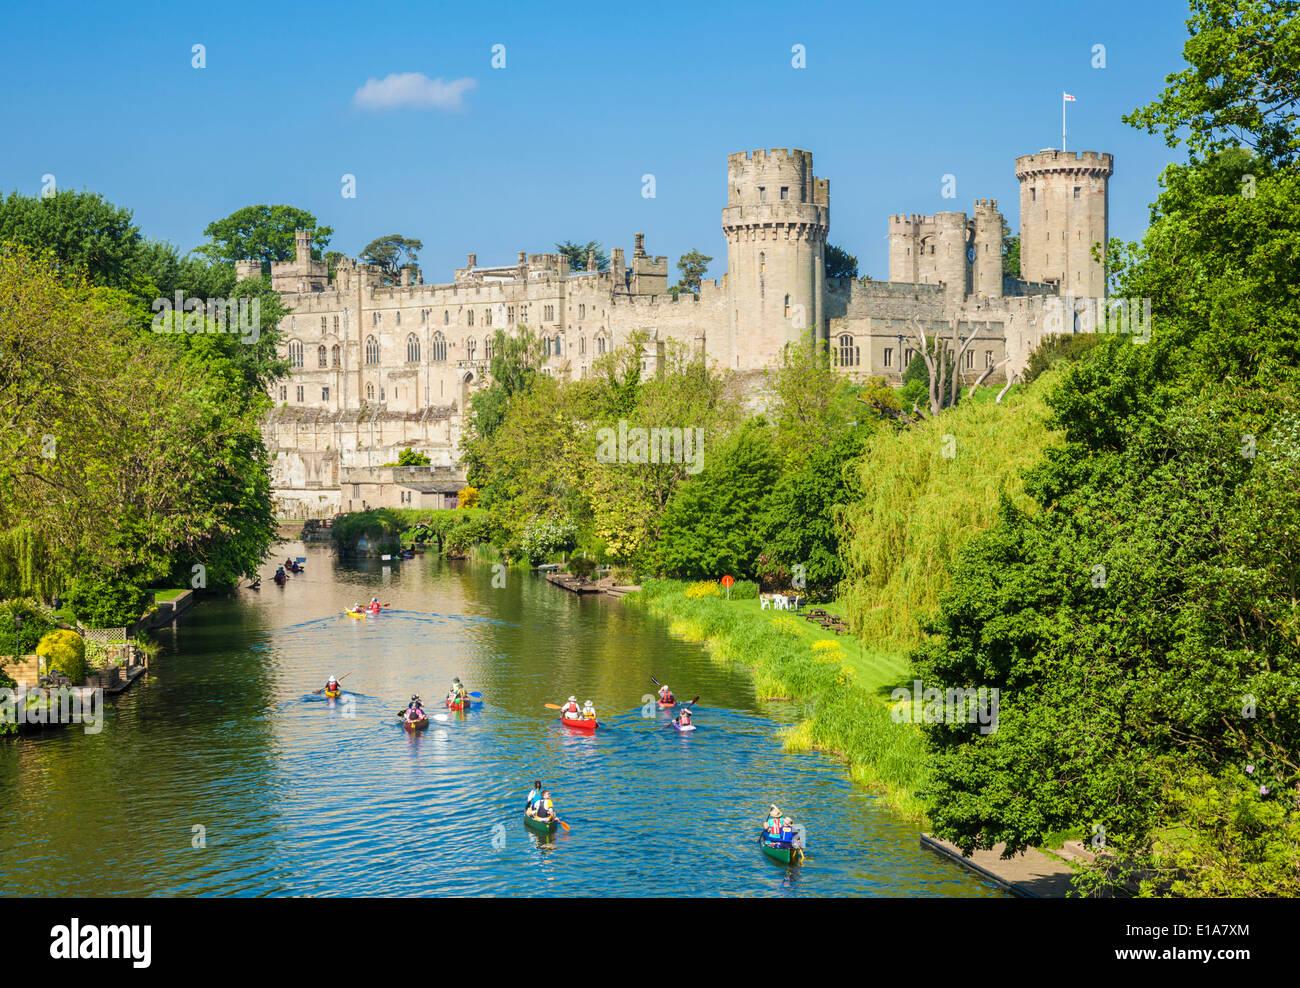 Tourist canoes, Warwick Castle and River Avon Warwick Warwickshire, England UK GB EU Europe - Stock Image